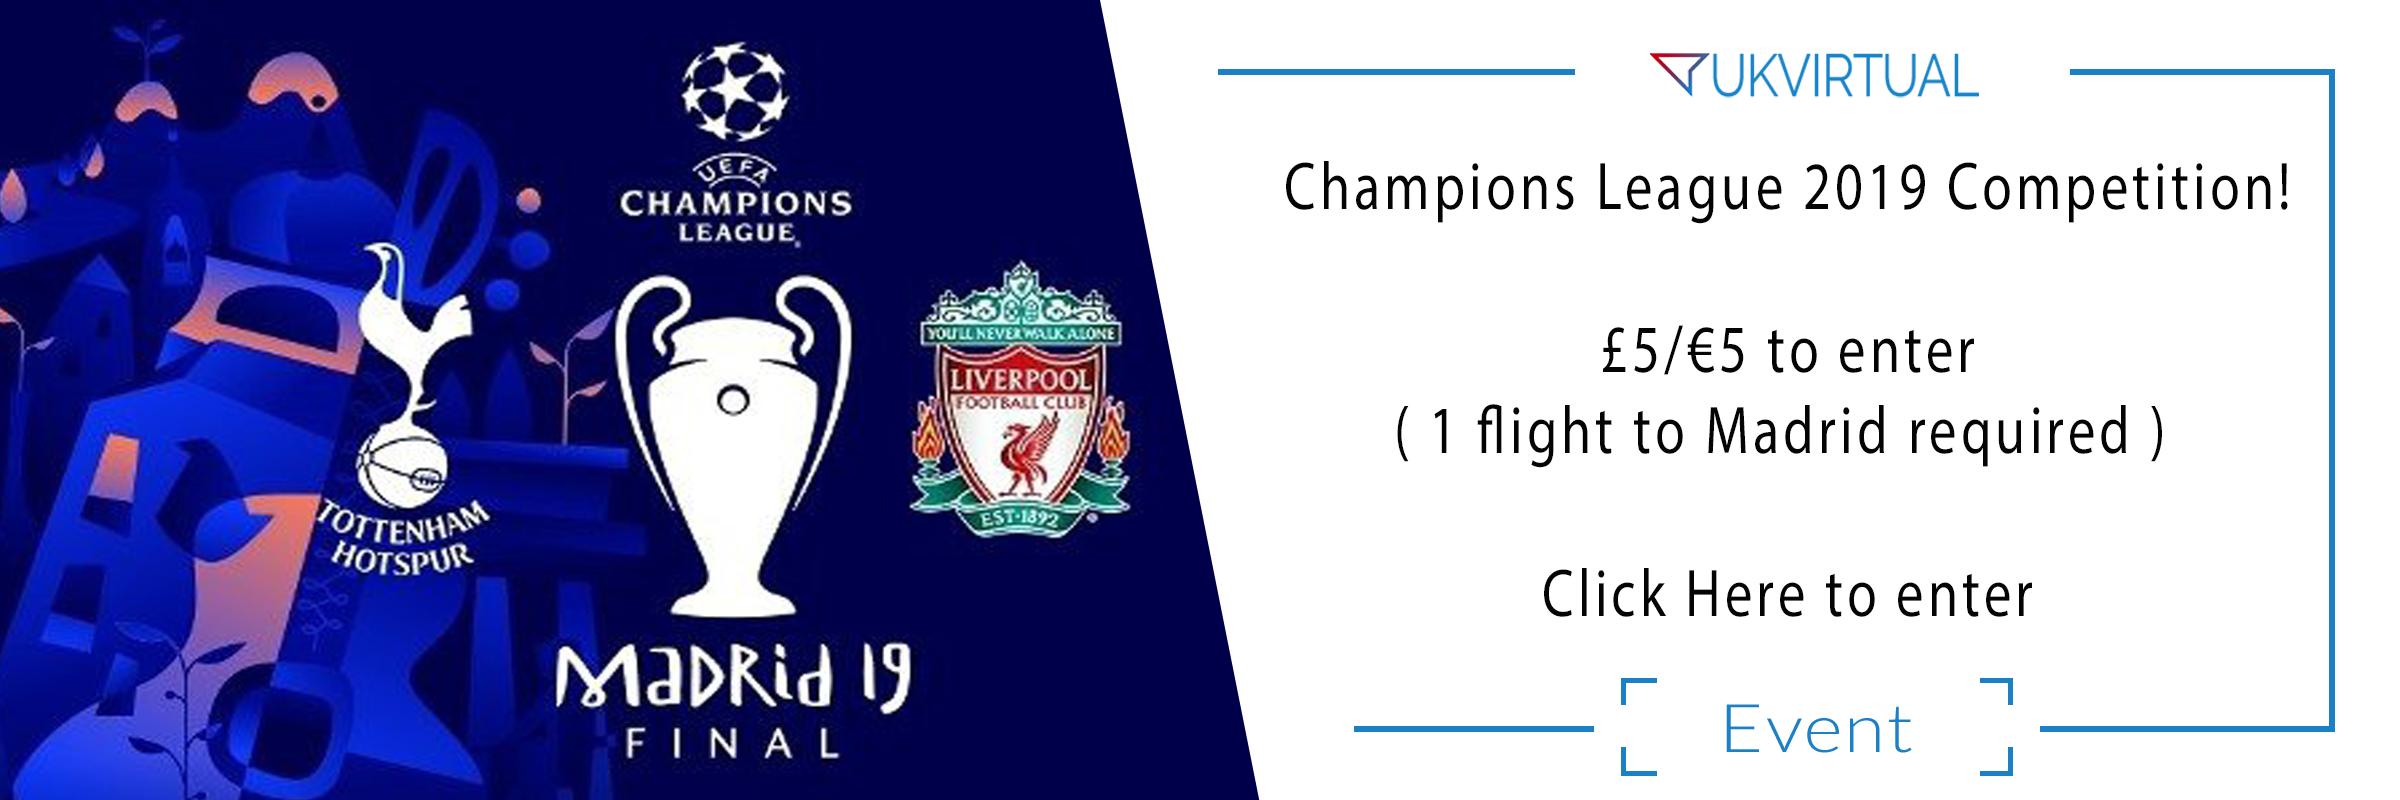 Champions League Competition